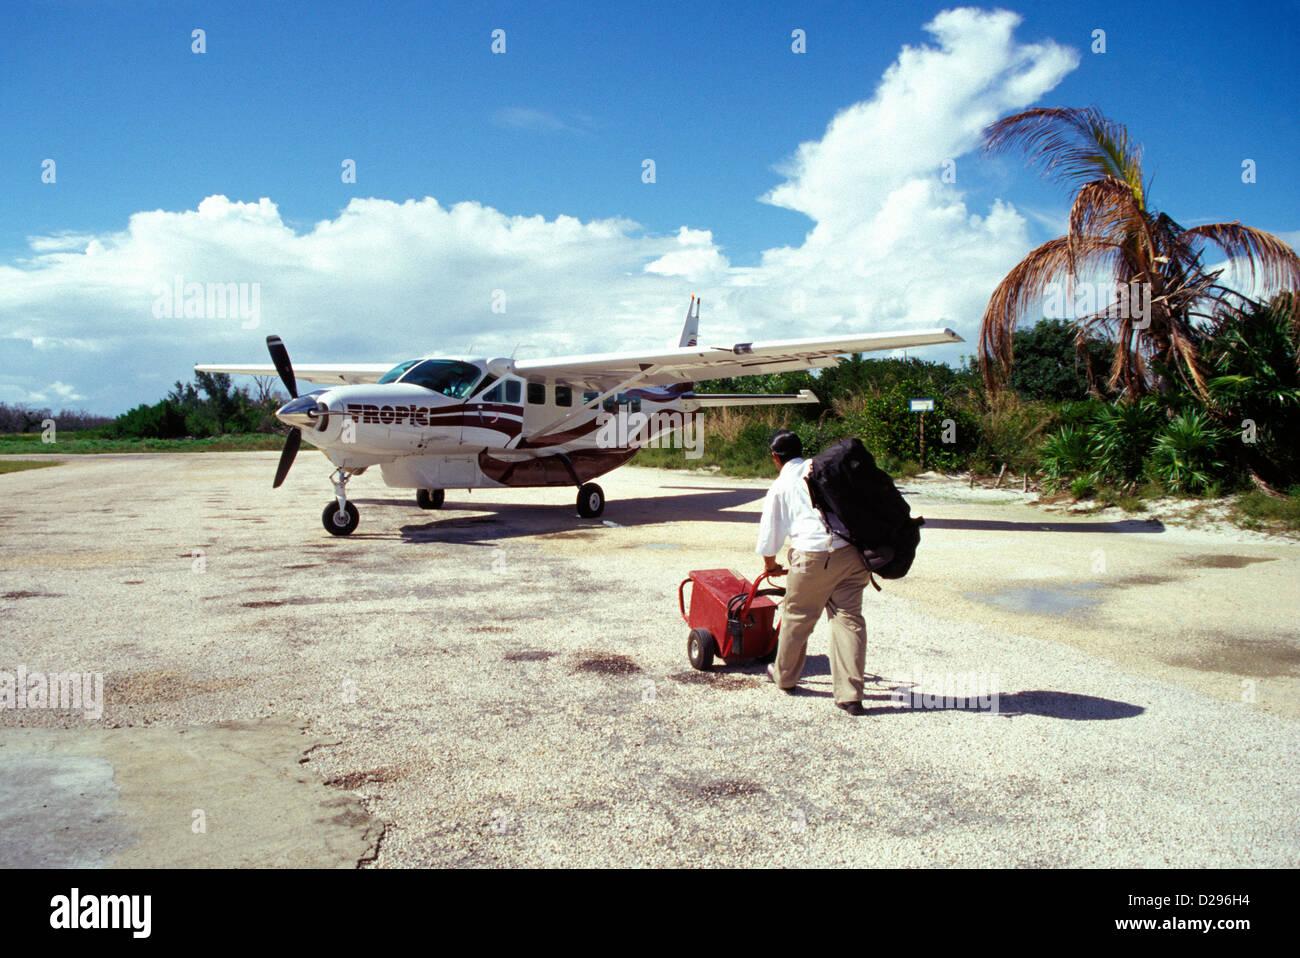 Belize, Caye Caulker. 12-Seater Airplane On Tarmac - Stock Image